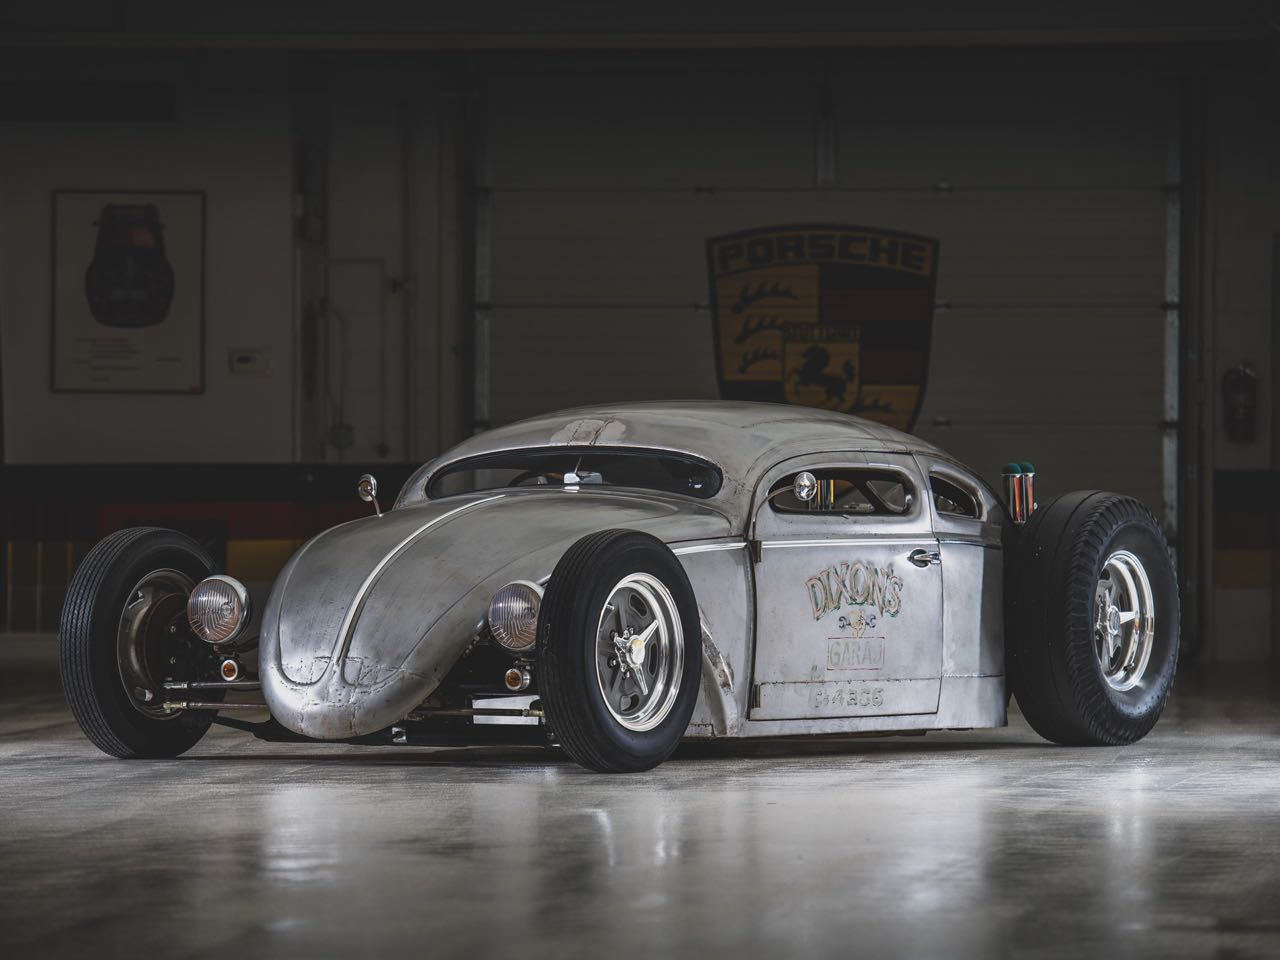 "'56 VW Beetle Outlaw ""Death"" by Franz Muhr - Heavy Metal ! 18"